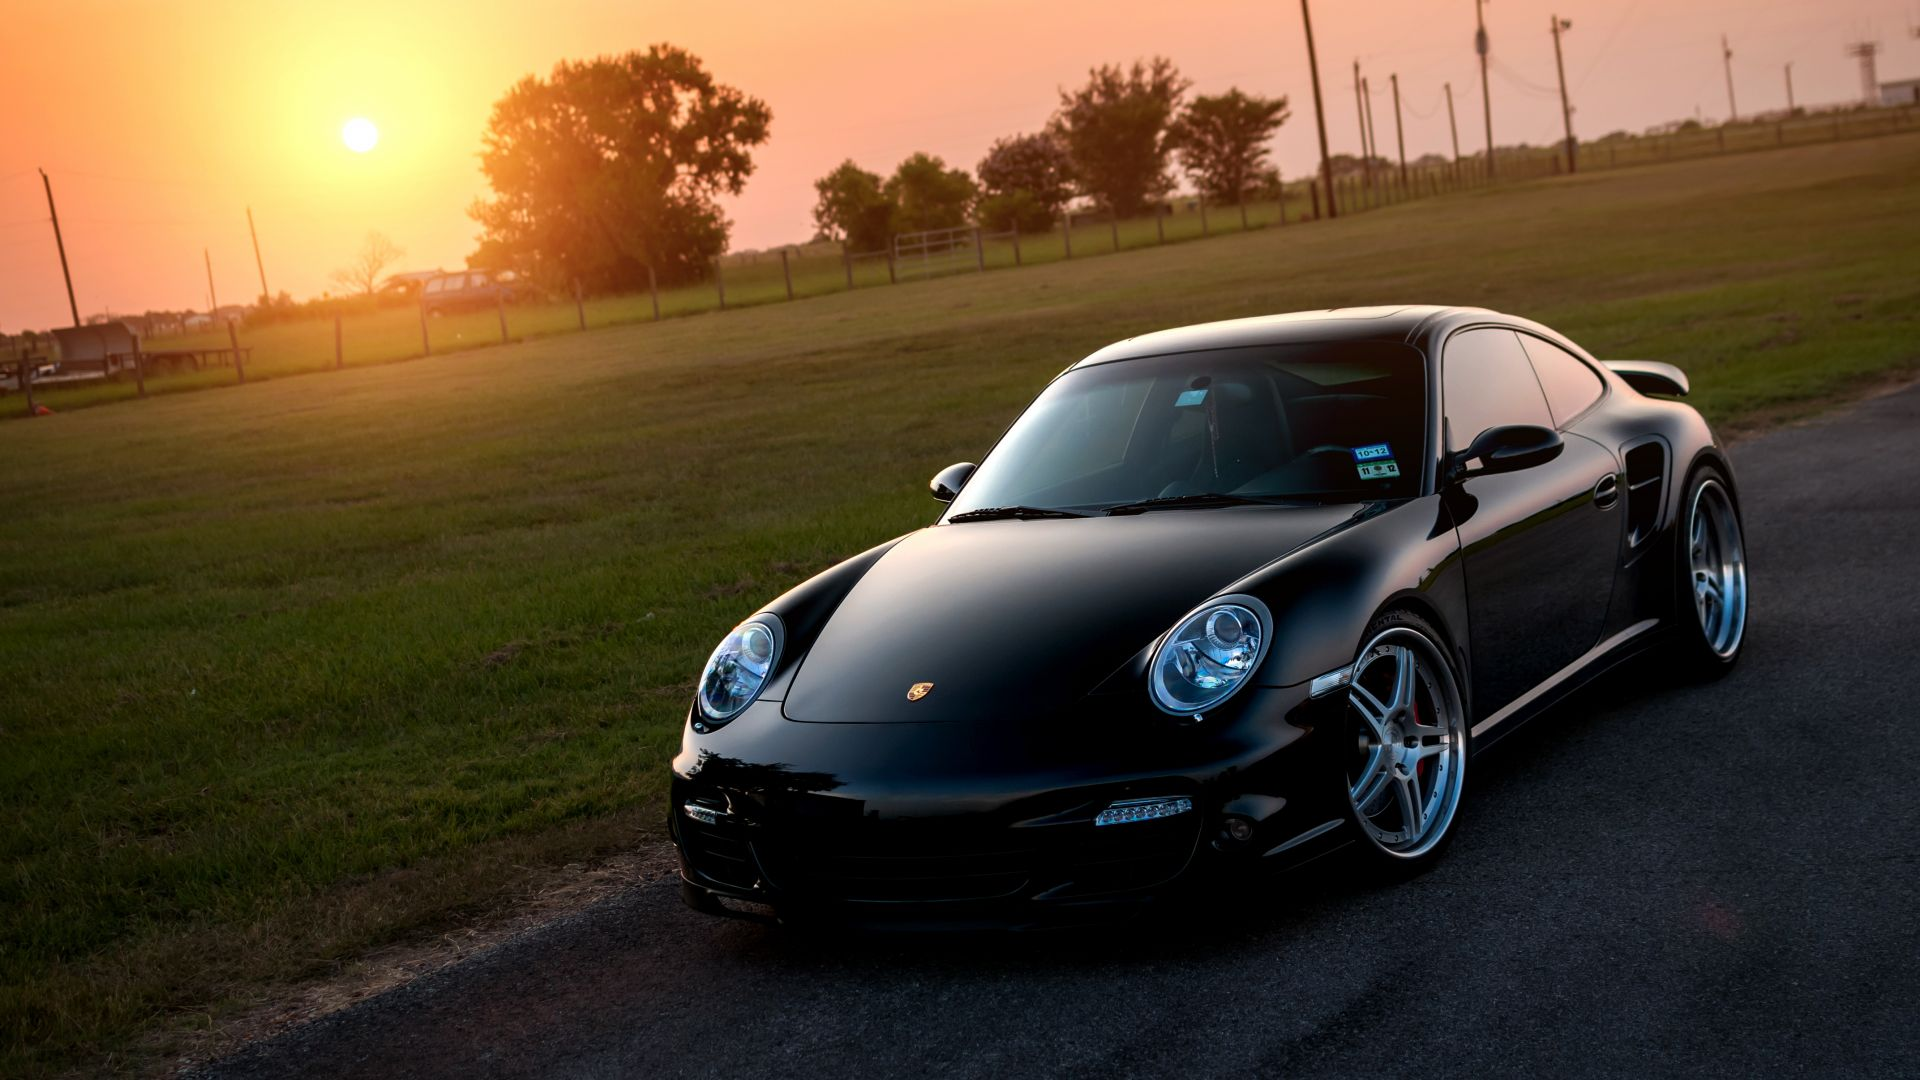 Wallpaper Porsche Boxster, black, sports car, sunset, landscape